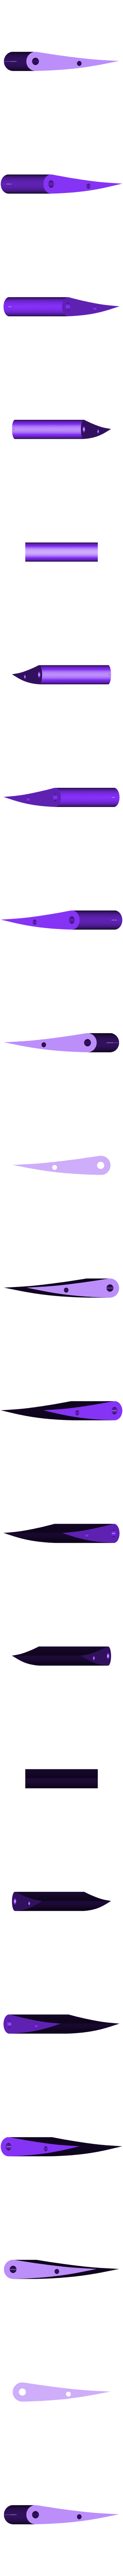 elevon_34.stl Download free STL file Speedy Red Midi Wing • Design to 3D print, wersy